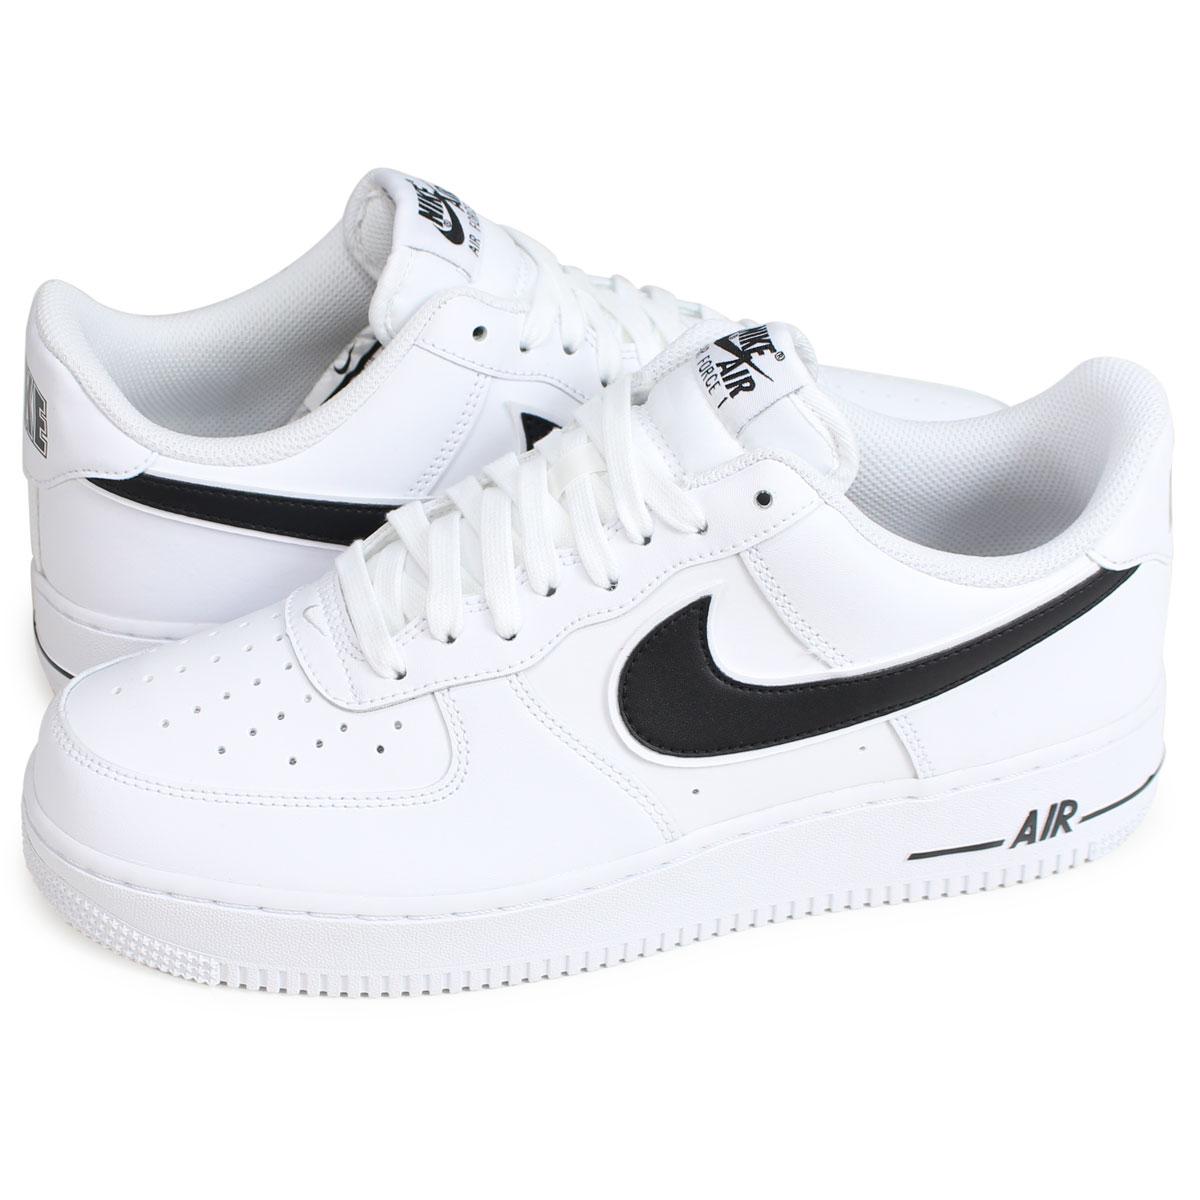 Nike Air Force 1 07 3 White Black On Sale